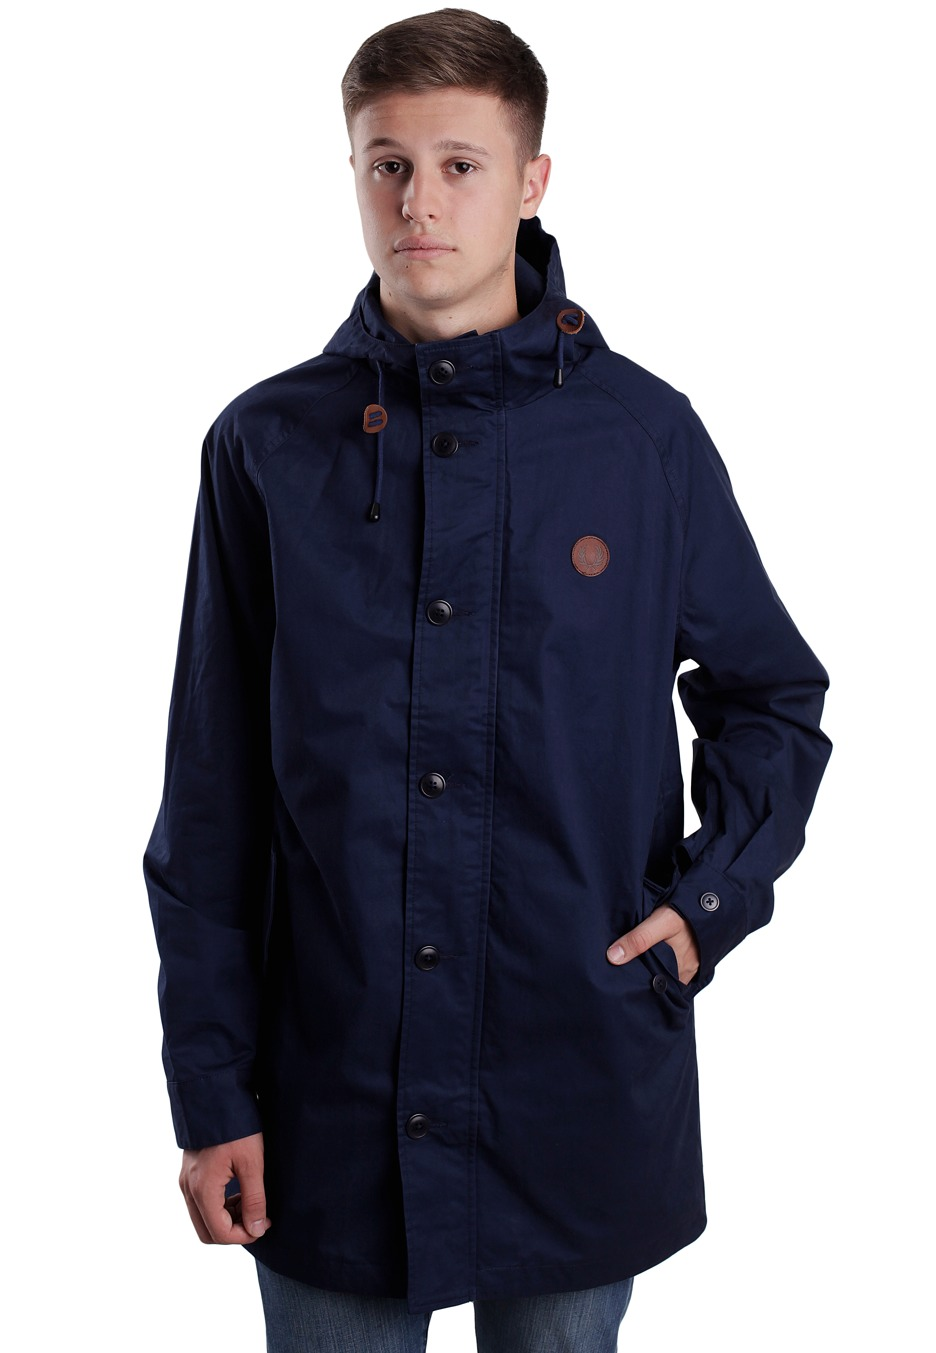 fred perry fishtale parka dark carbon jacket streetwear shop worldwide. Black Bedroom Furniture Sets. Home Design Ideas